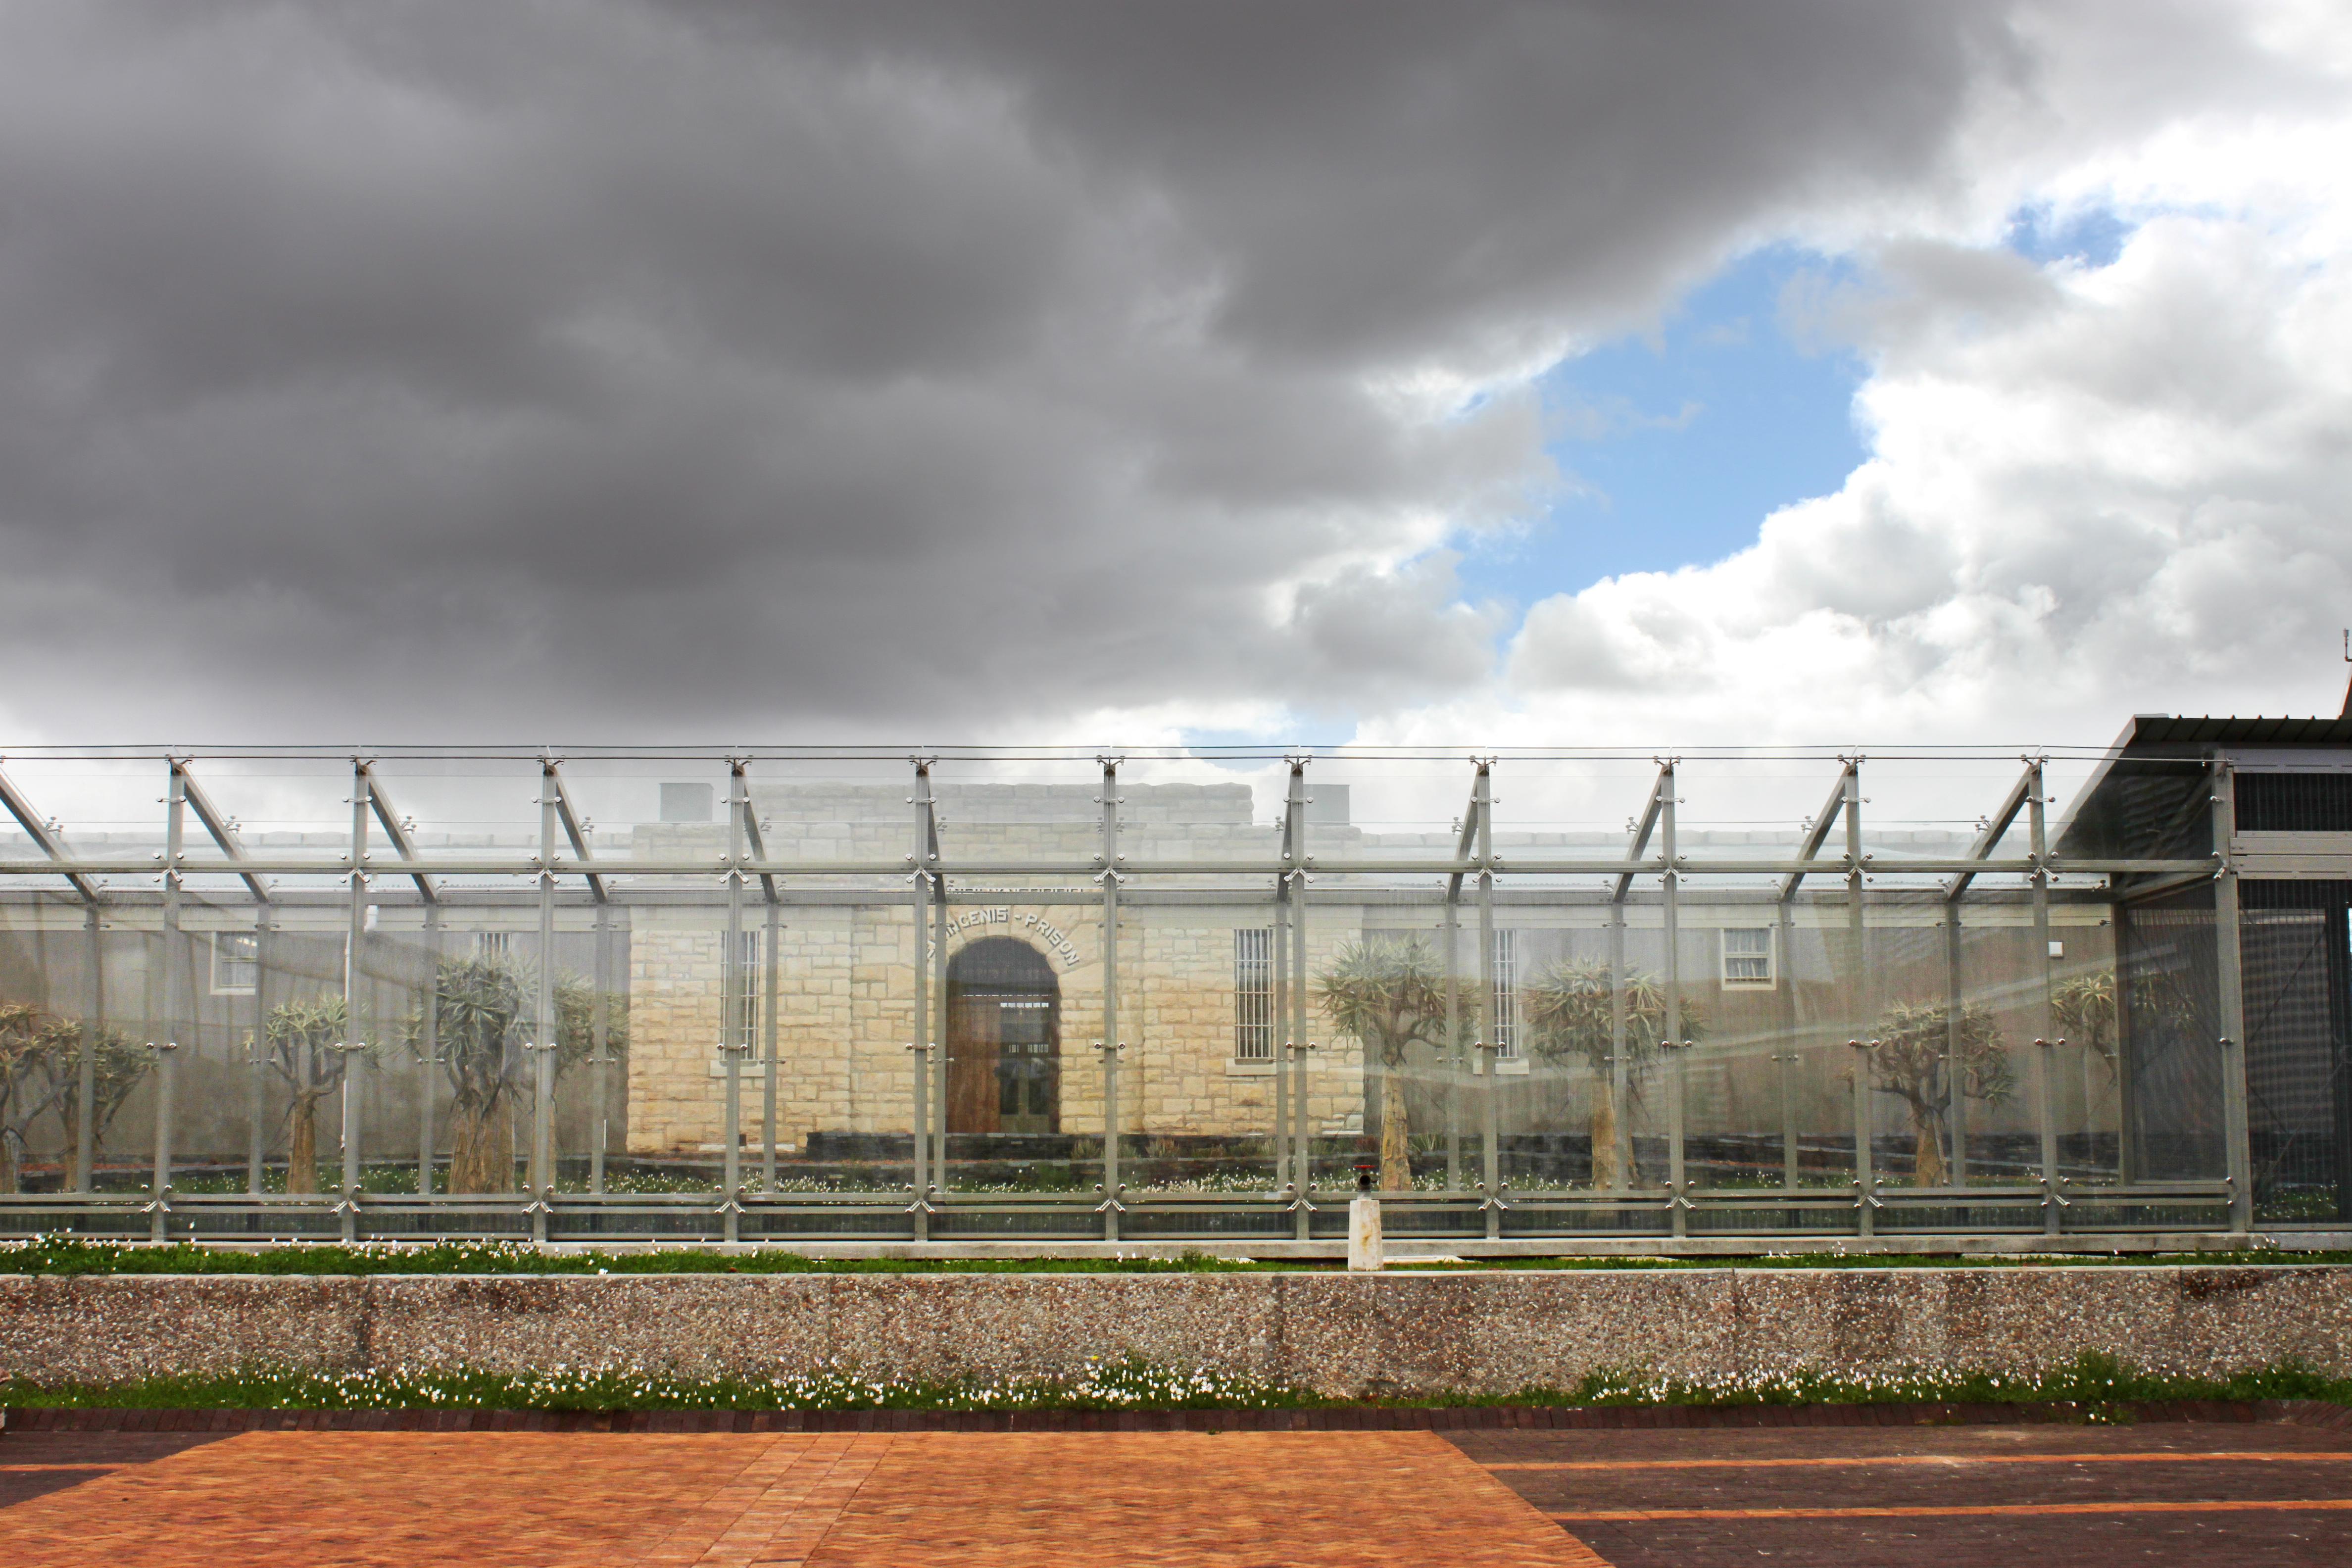 Van Rhynsdorp Prison